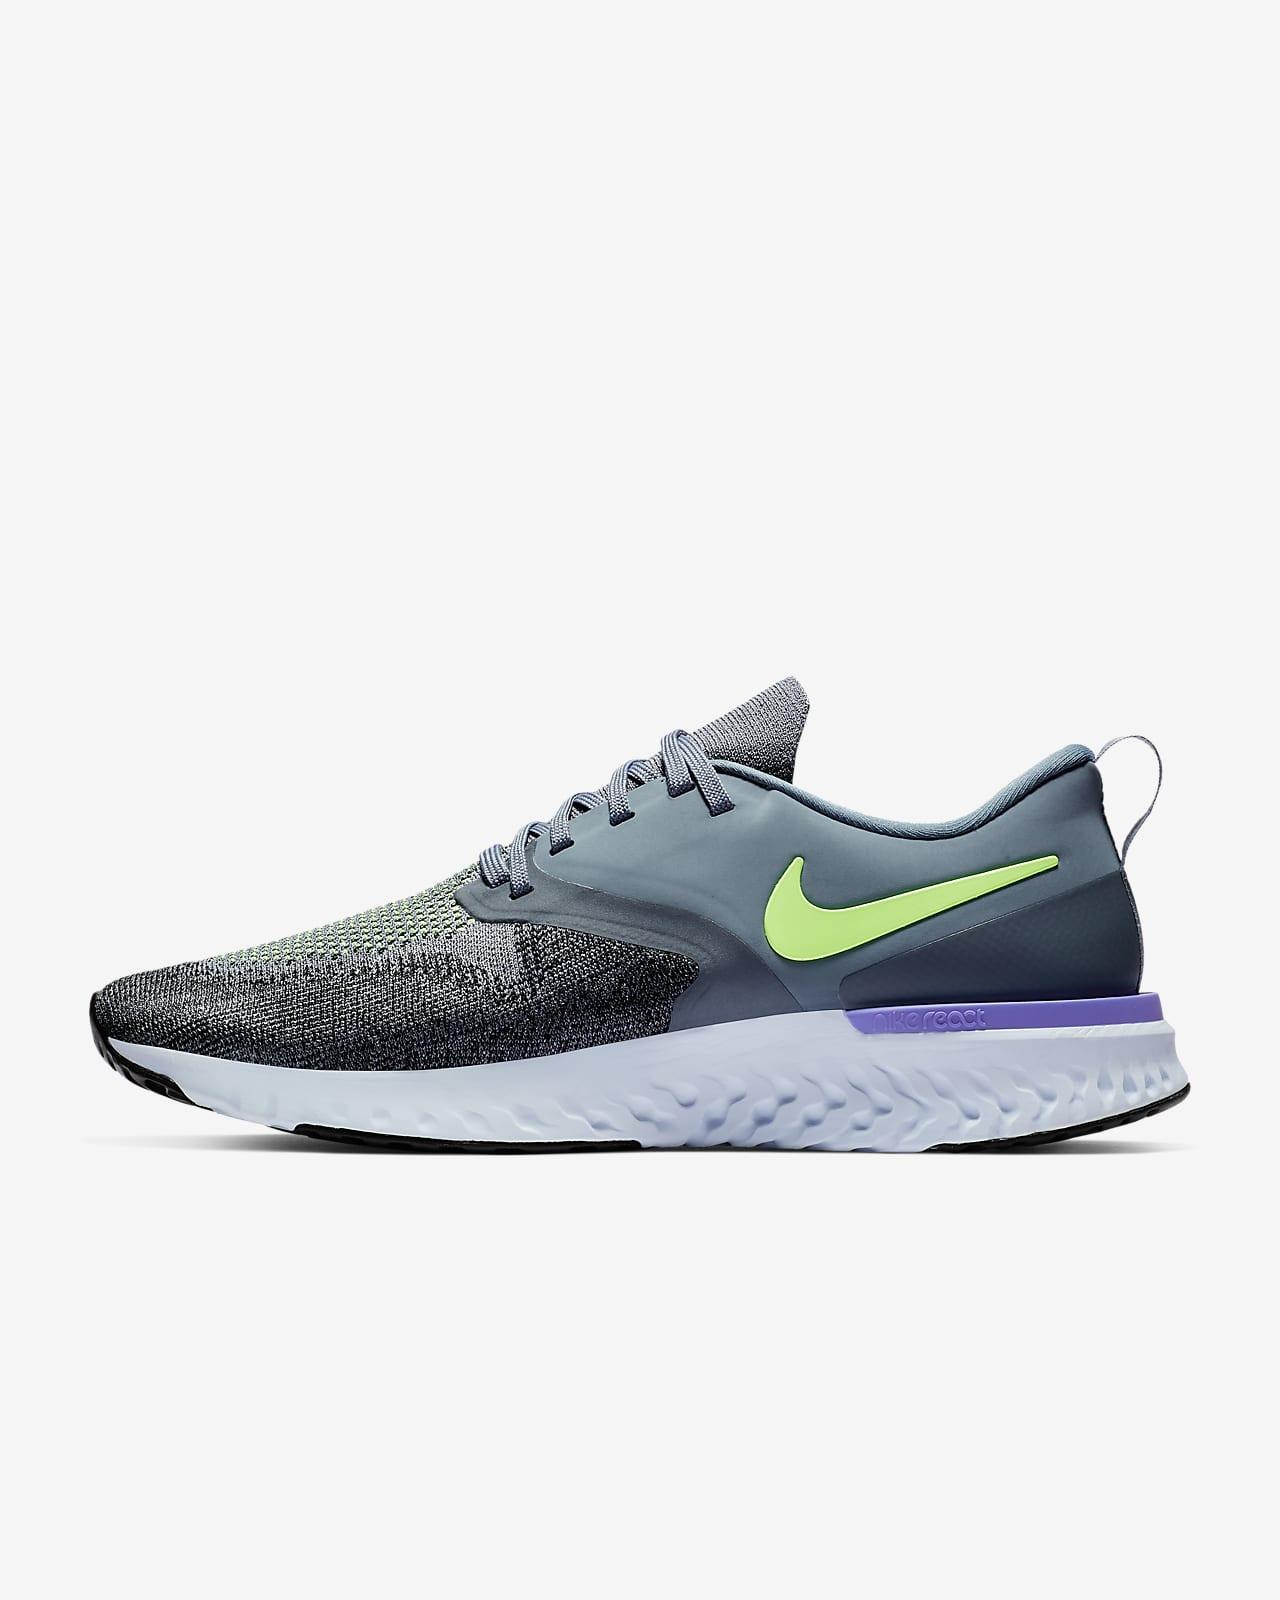 campana Ánimo elevación  Nike Odyssey React Flyknit 2 Men's Running Shoe. Nike ID